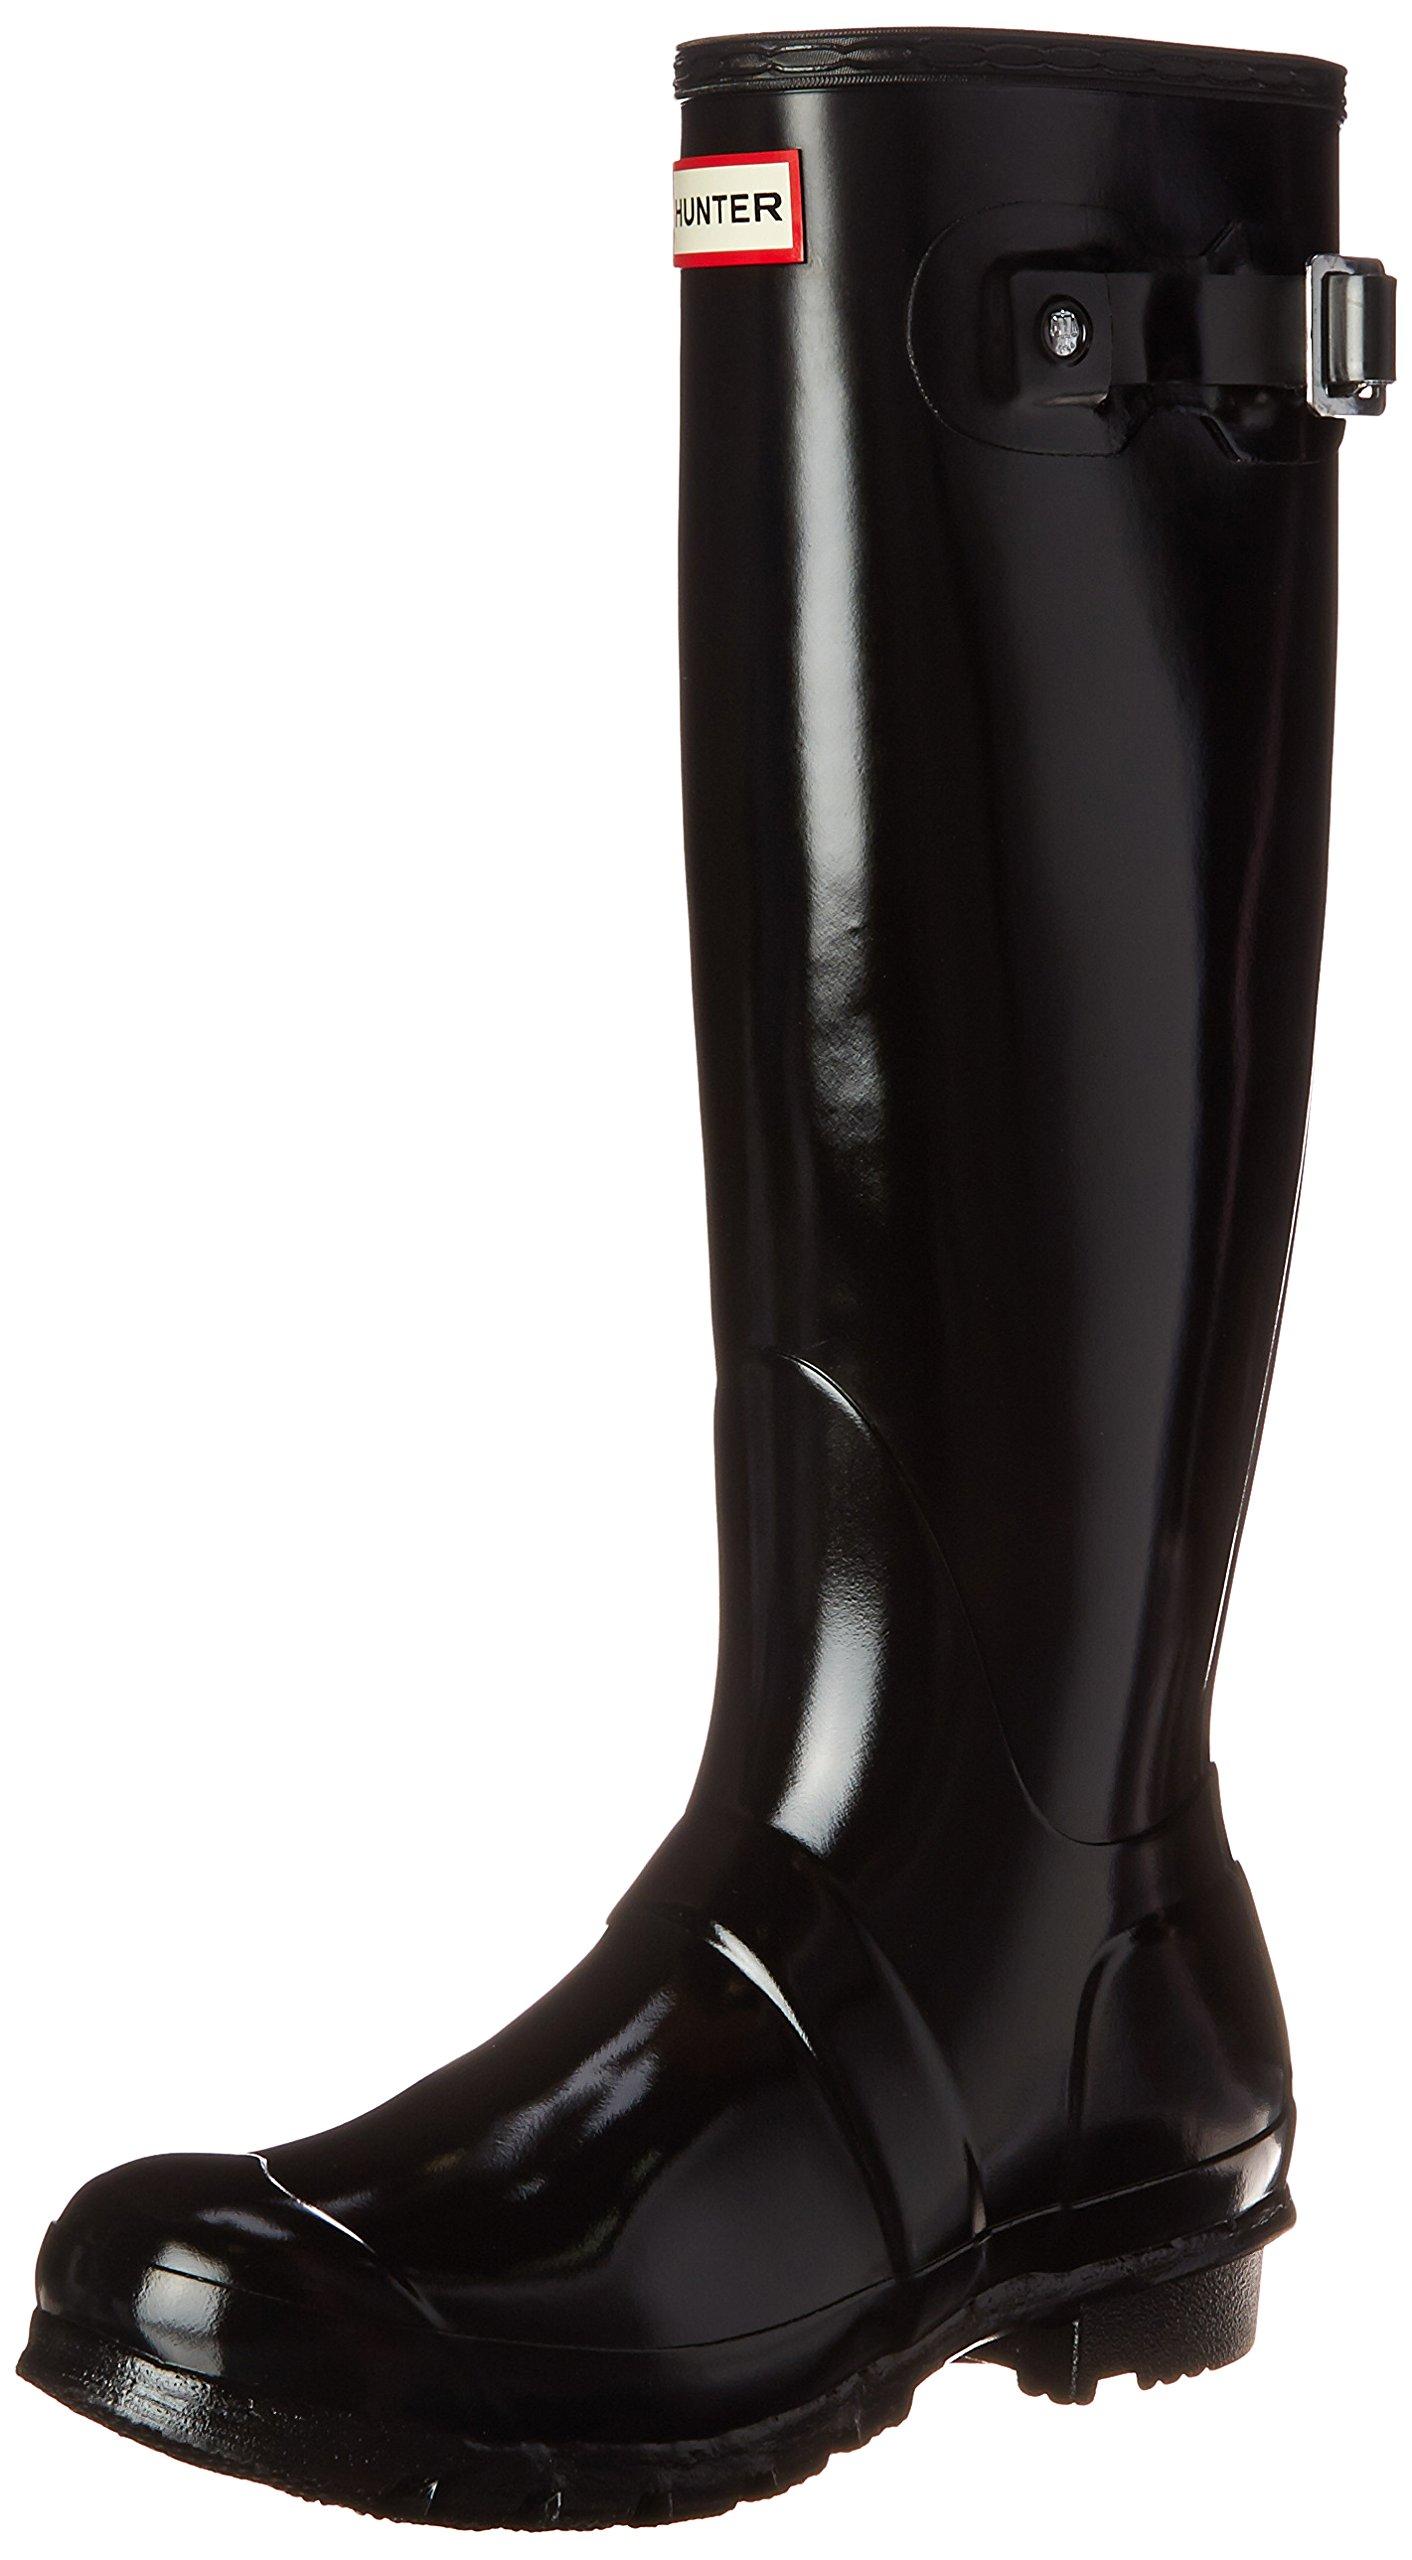 Hunter Women's Original Gloss Snow Boot, Black Gloss, 7 M